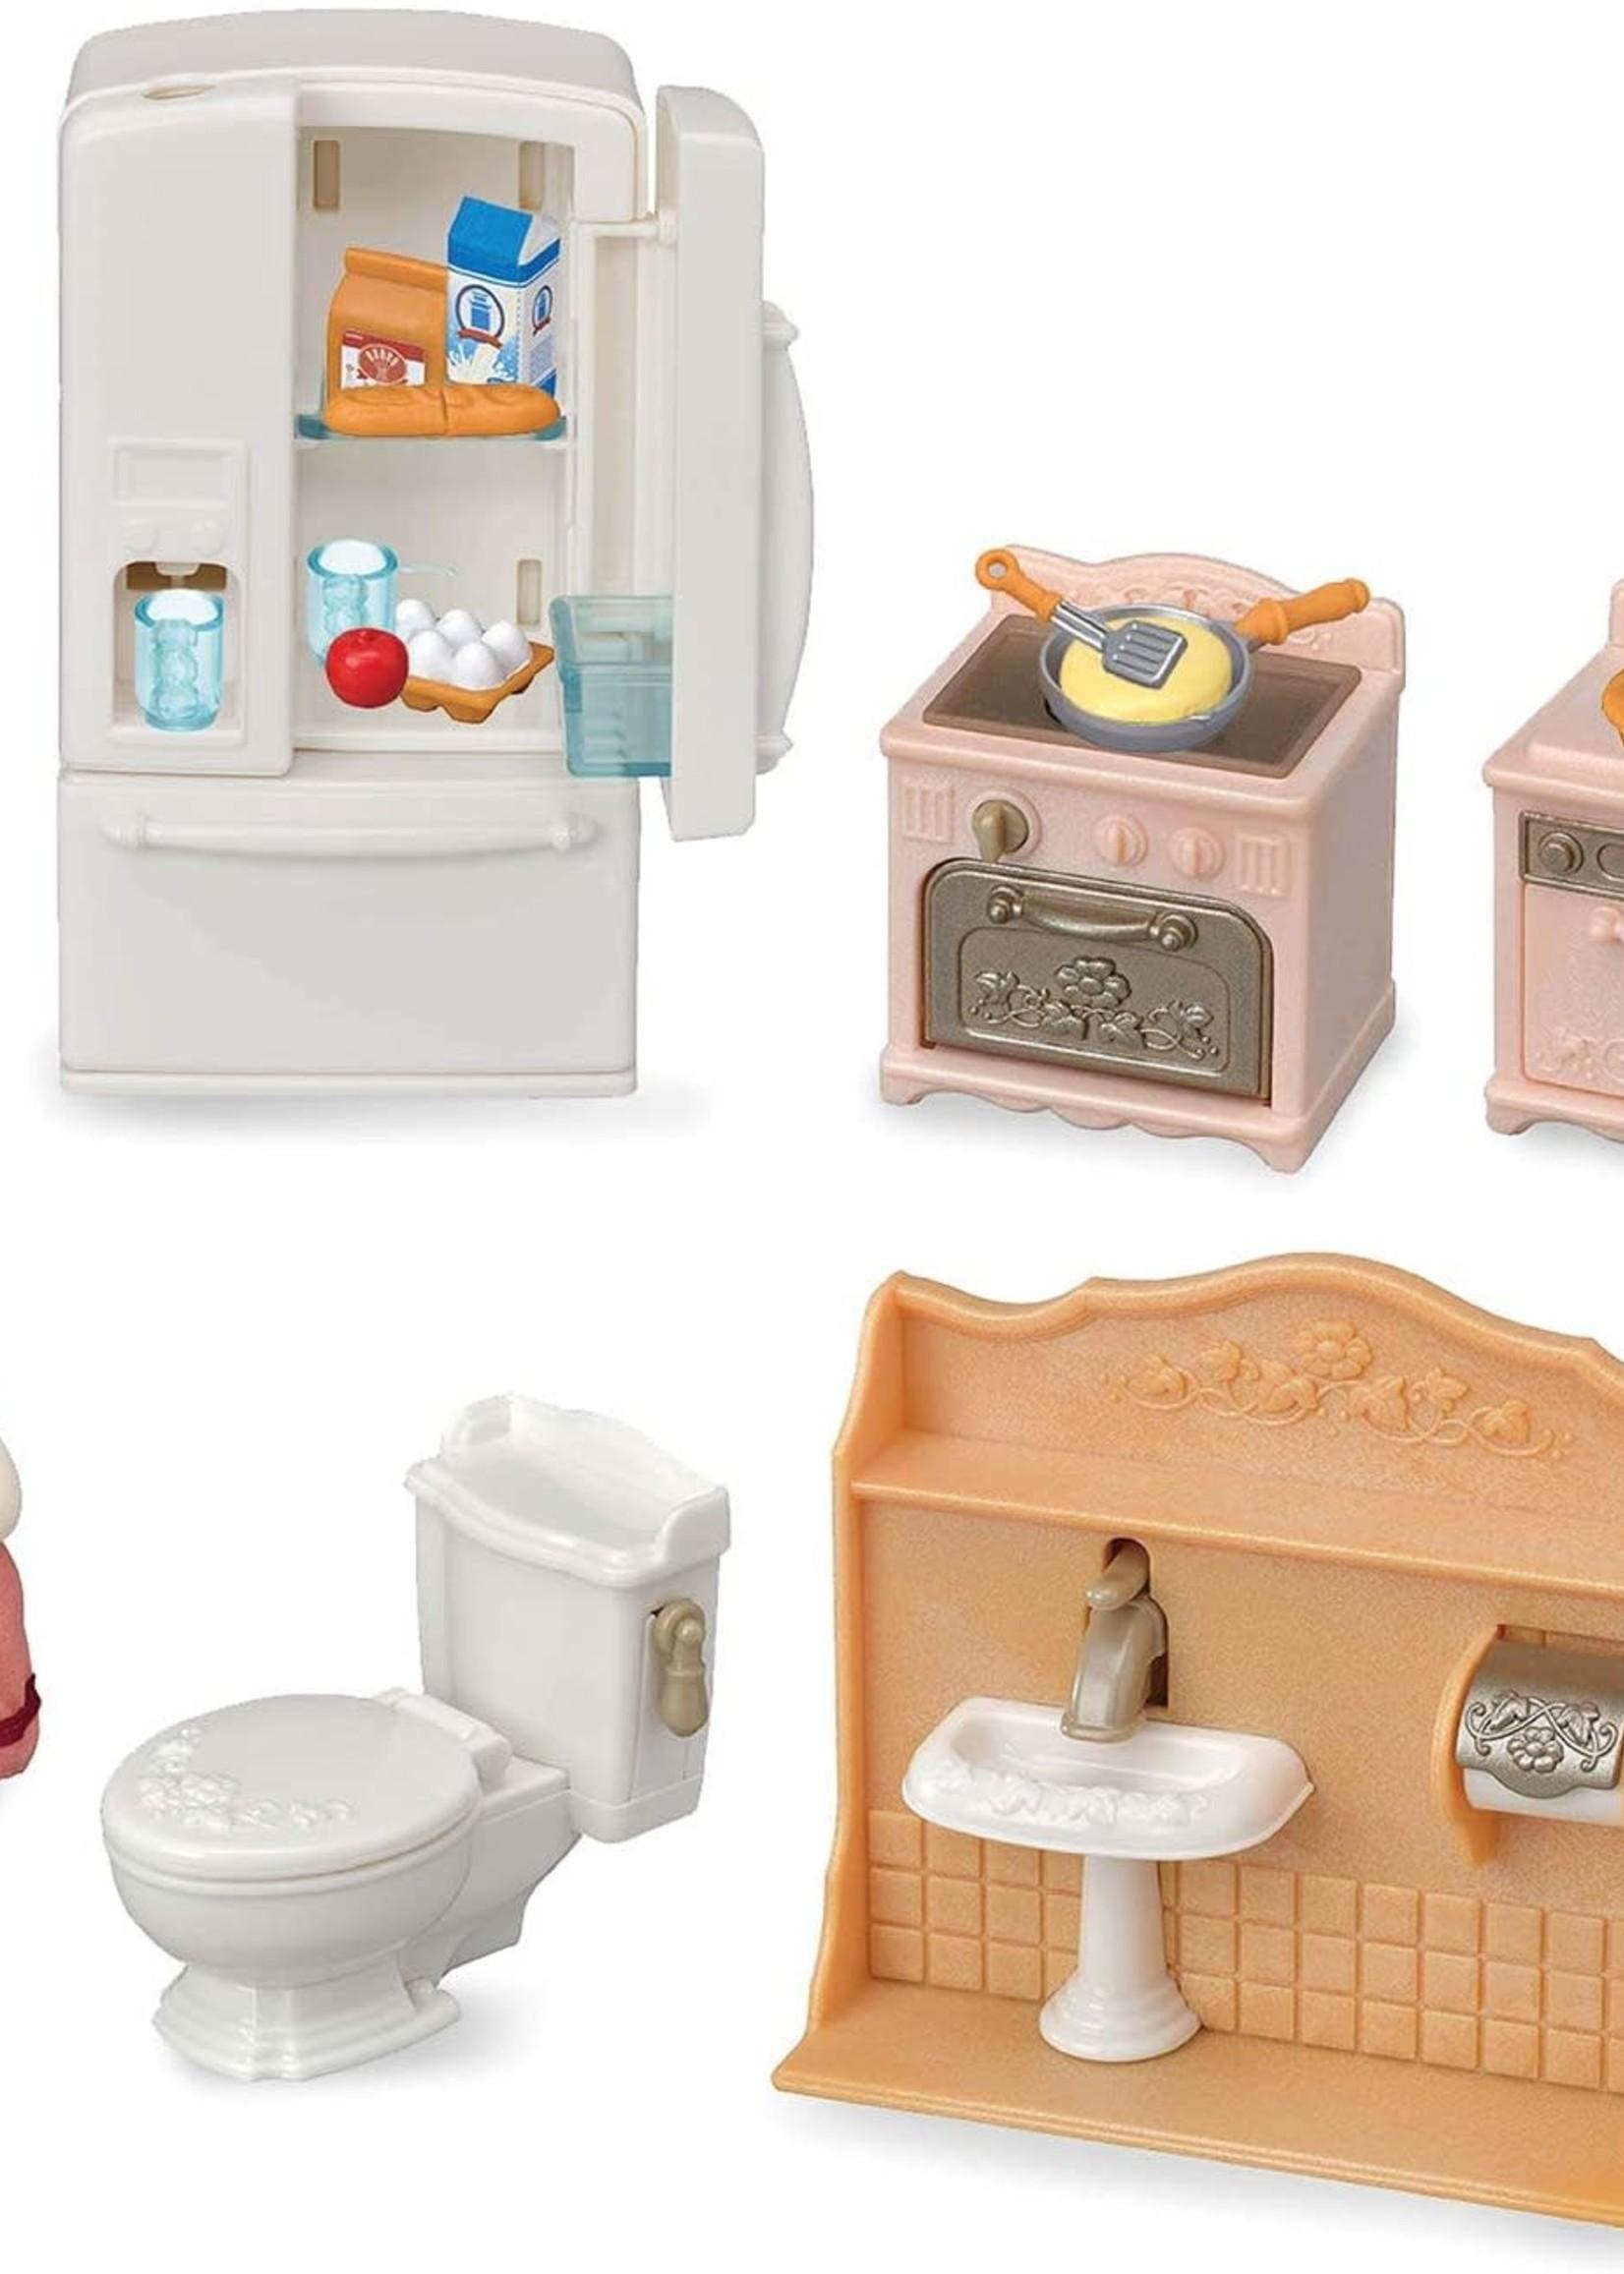 Calico Critters Playful Starter Furniture Set